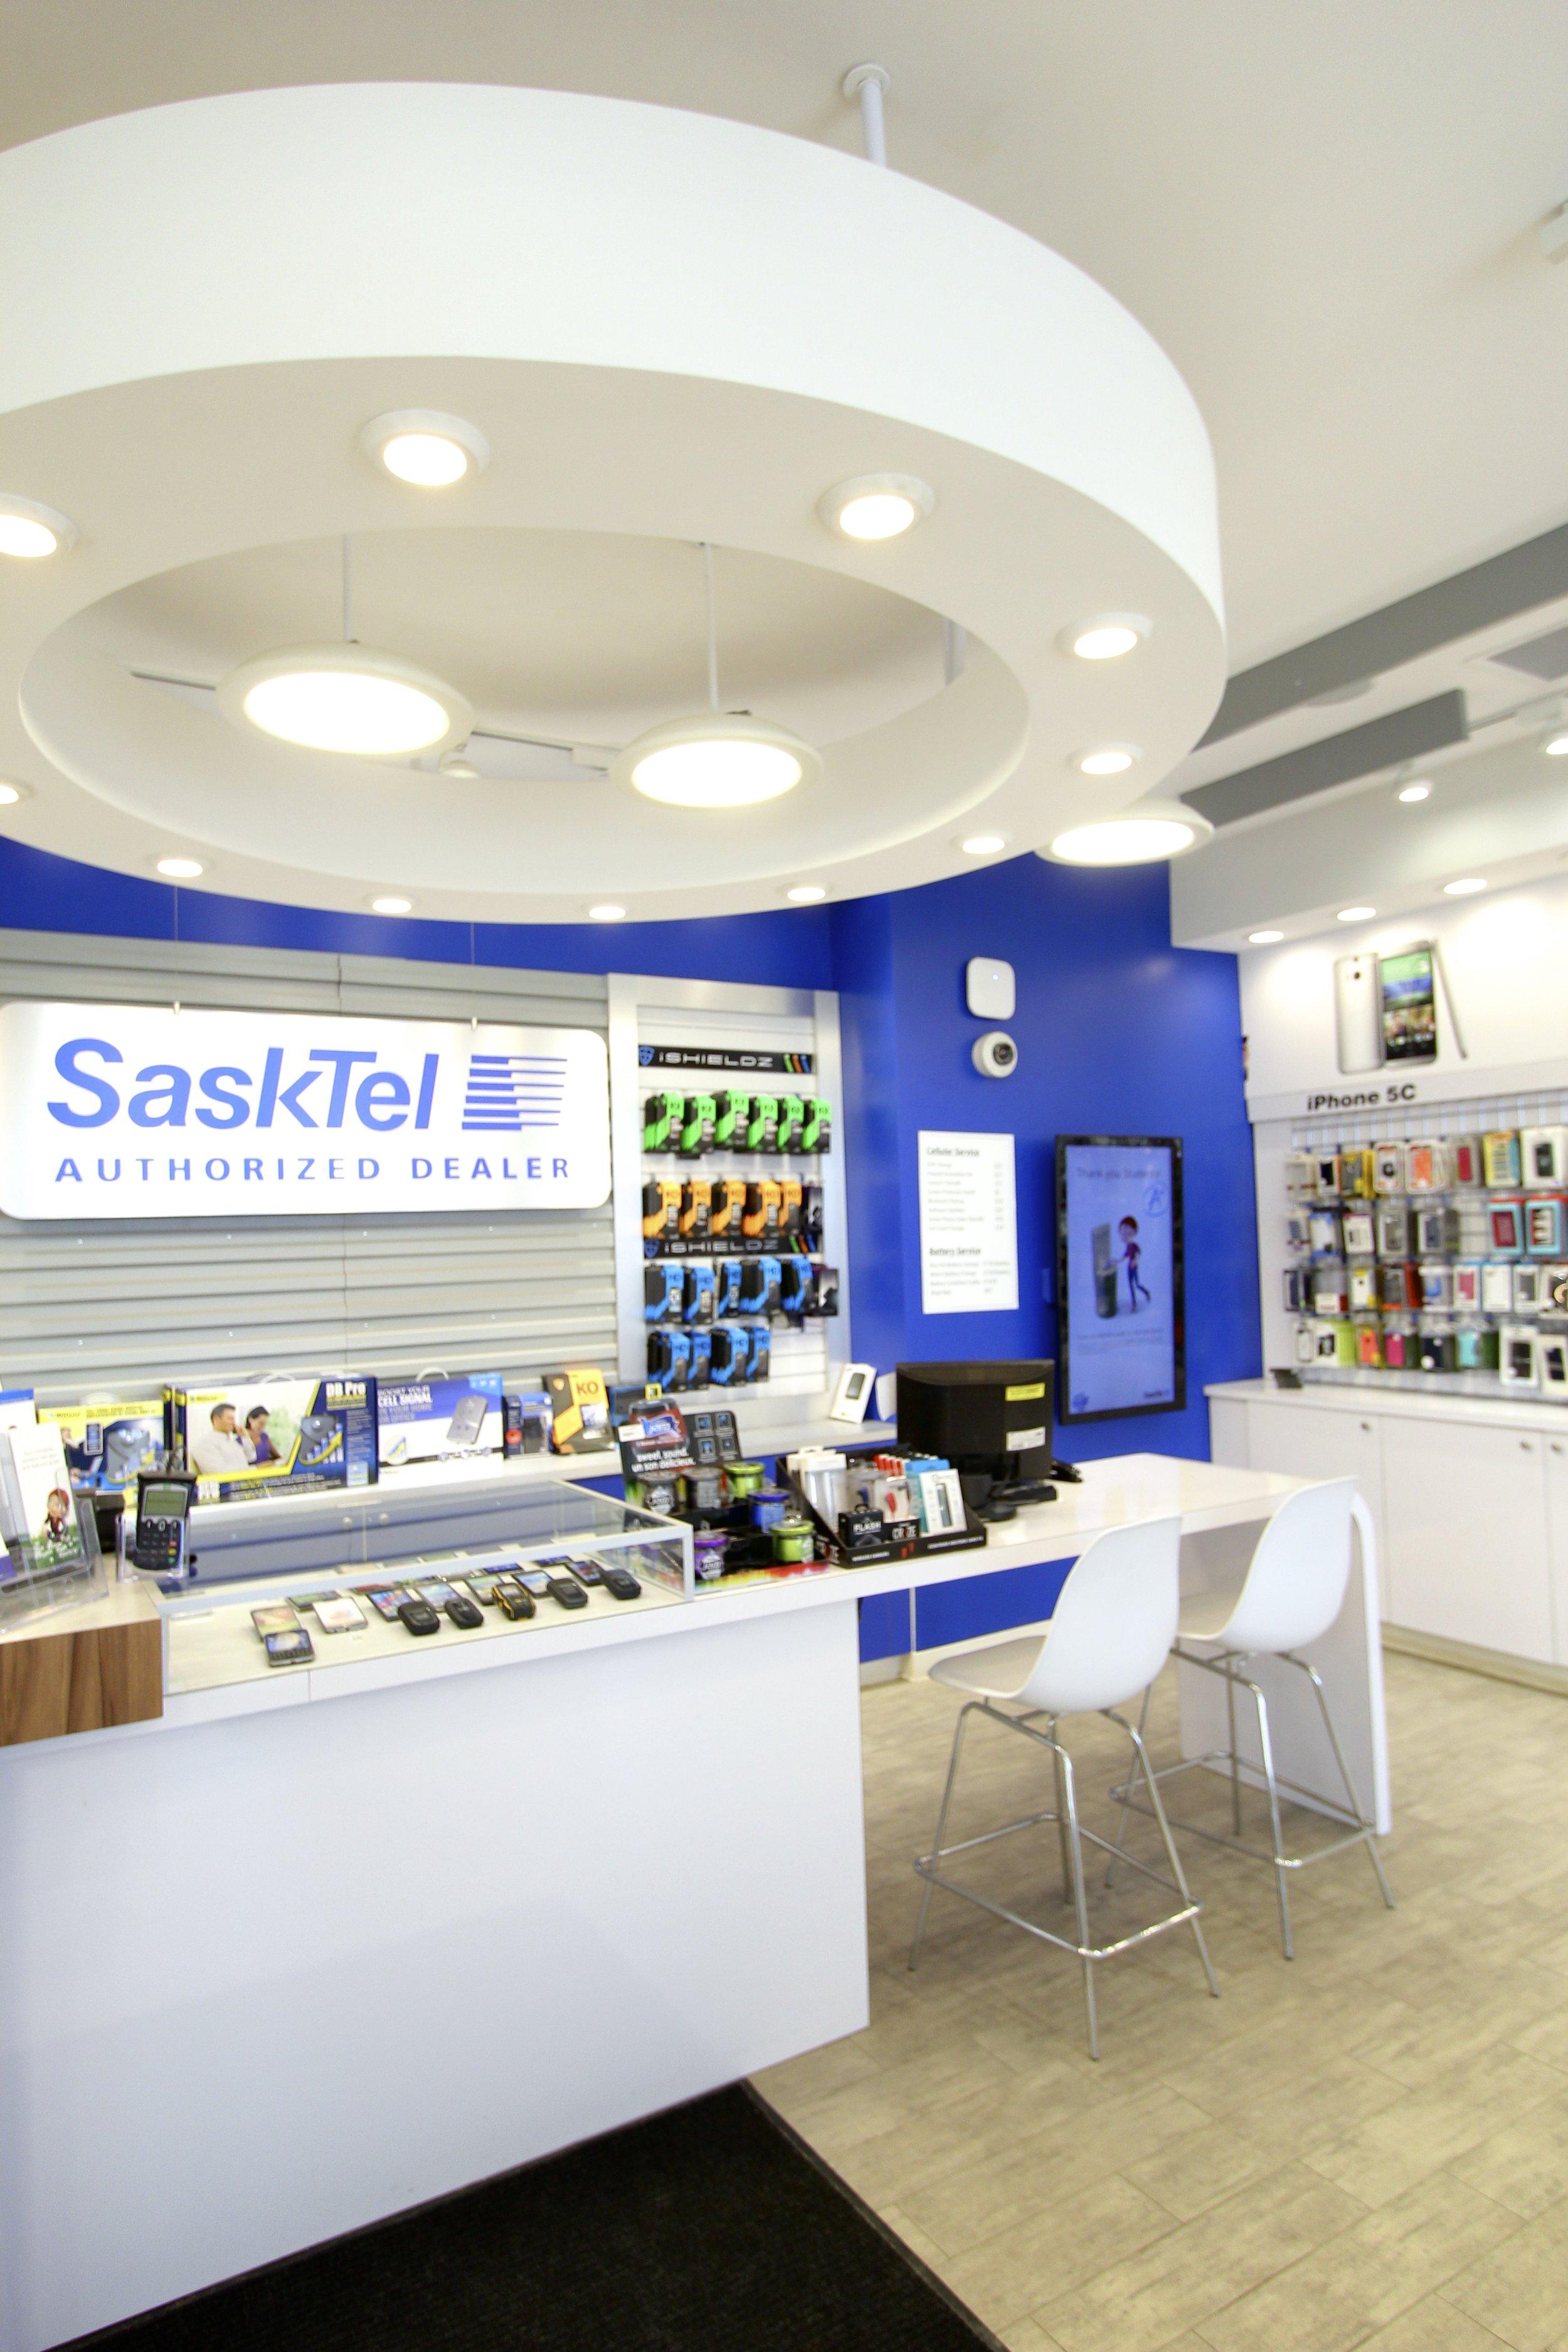 Metric Design Centre, Interior Design, Saskatoon, Renovation, Best, Commercial, Retail, Cell Phones, Lighting, Display, Front Desk, Bulkhead, Battery Boys.jpg